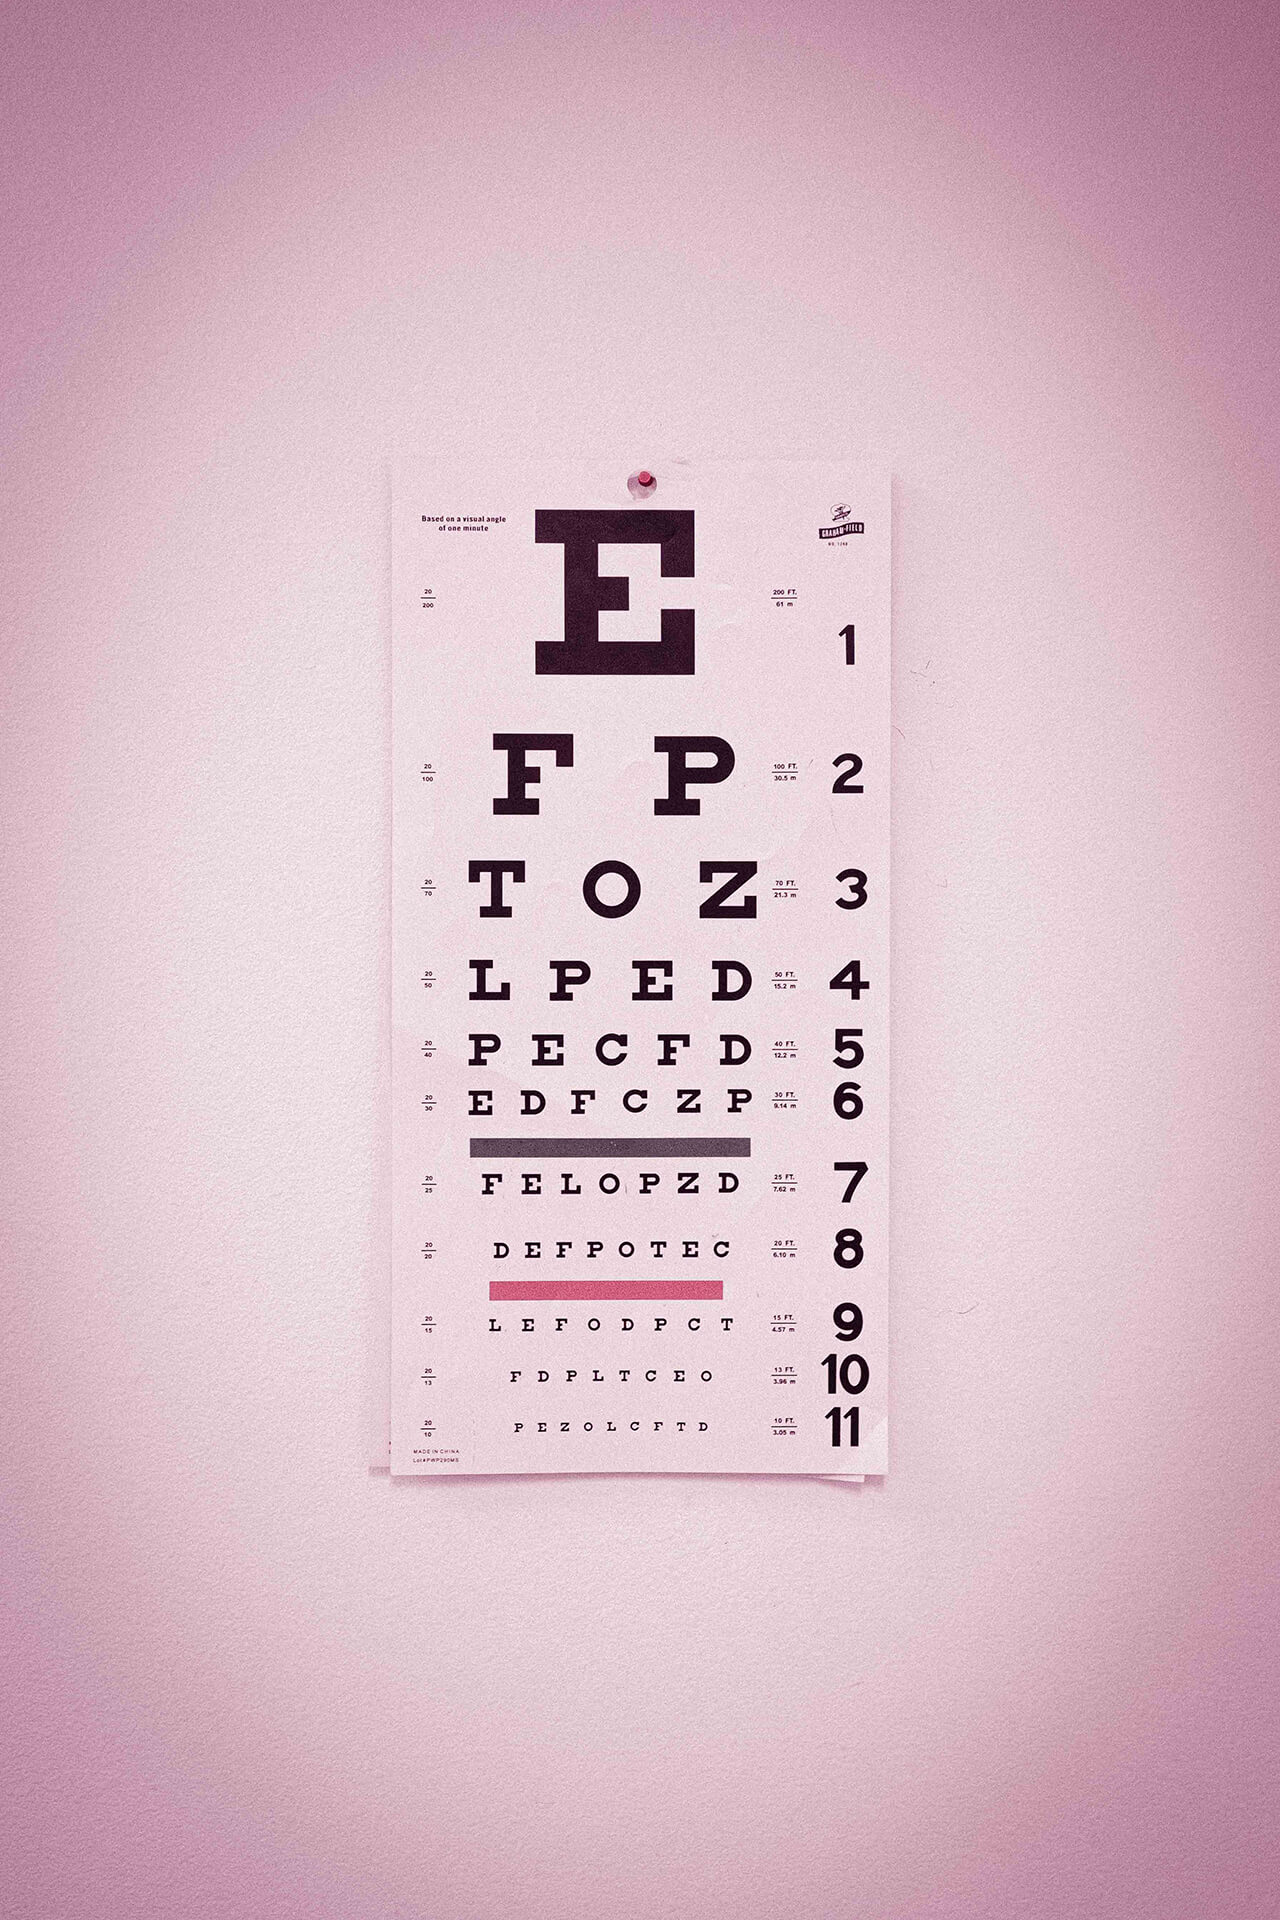 An eye examination chart.